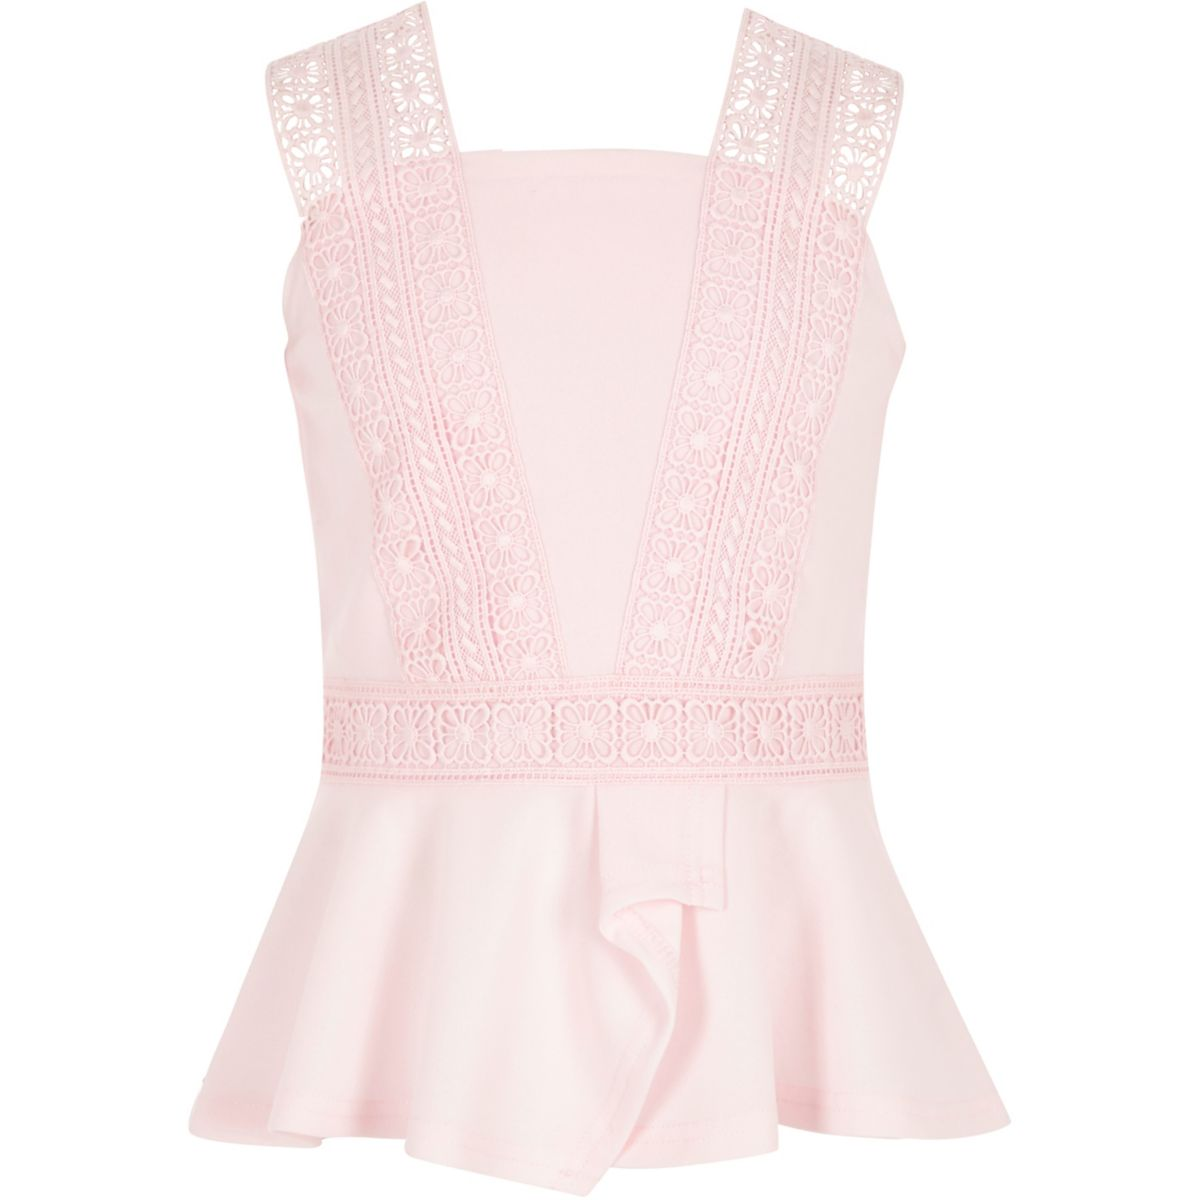 Girls pink lace trim peplum top